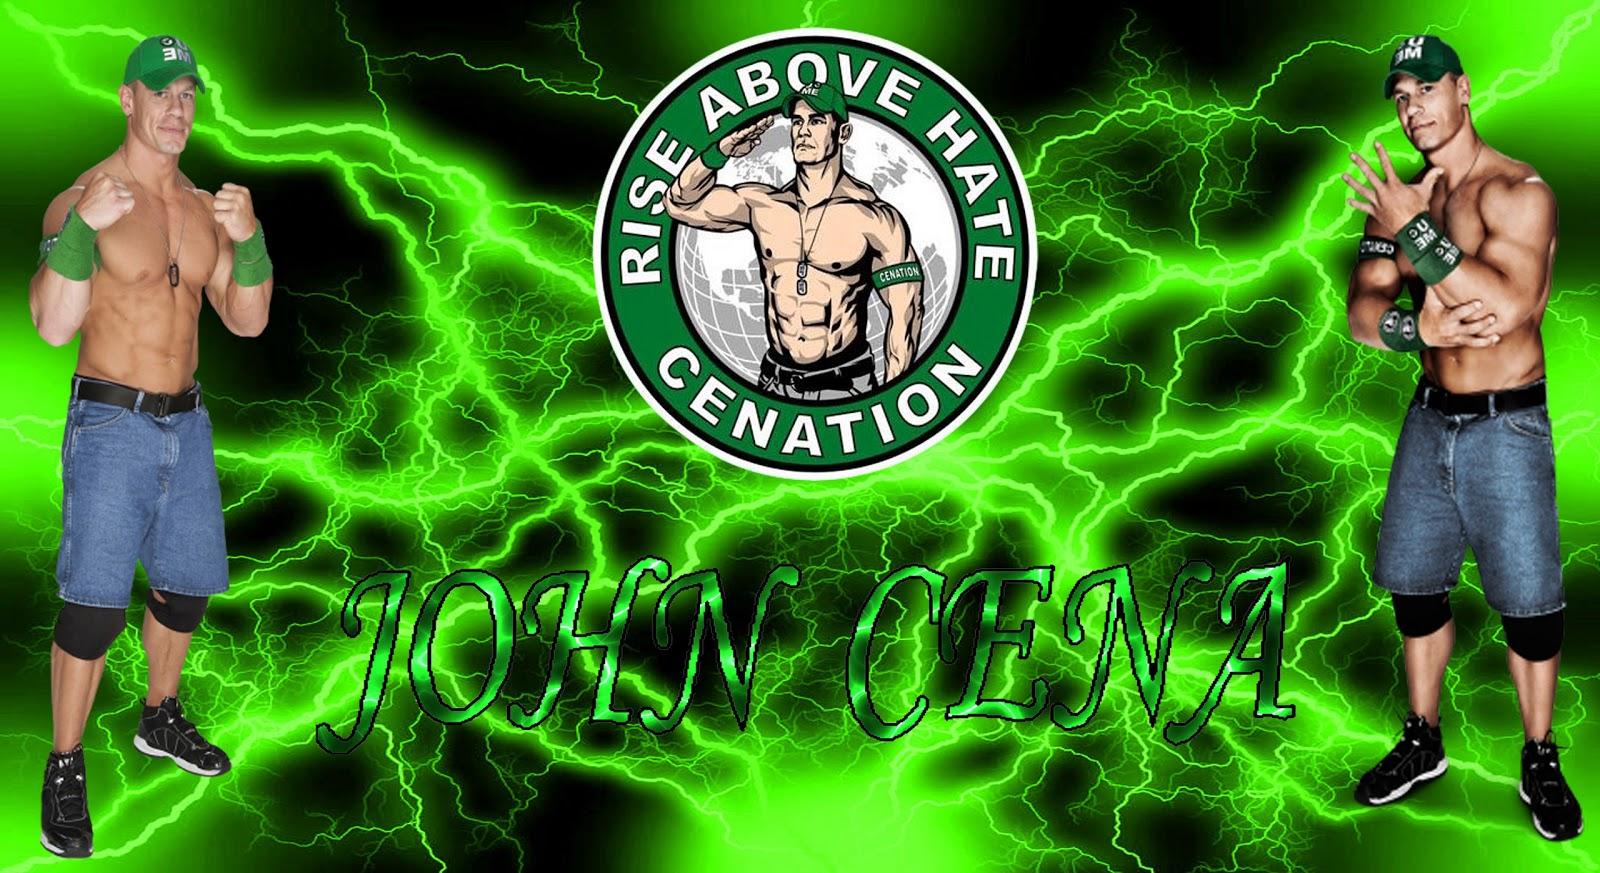 john cena green wallpapers 2013 wrestling and wrestlers